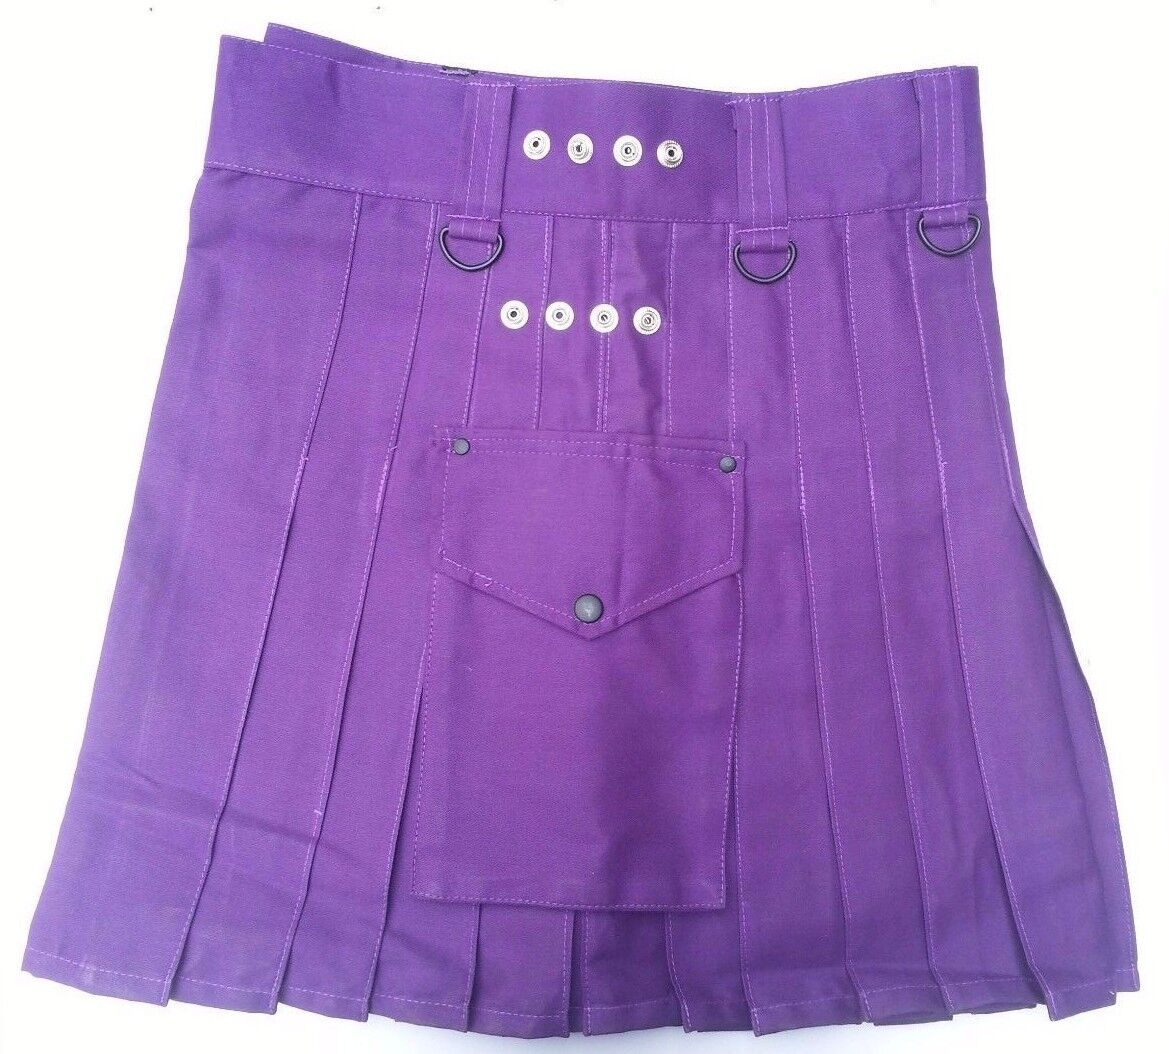 Ladies Purple Cotton Leather Straps Fashion Sport Utility Kilt, Adjustable Sizes